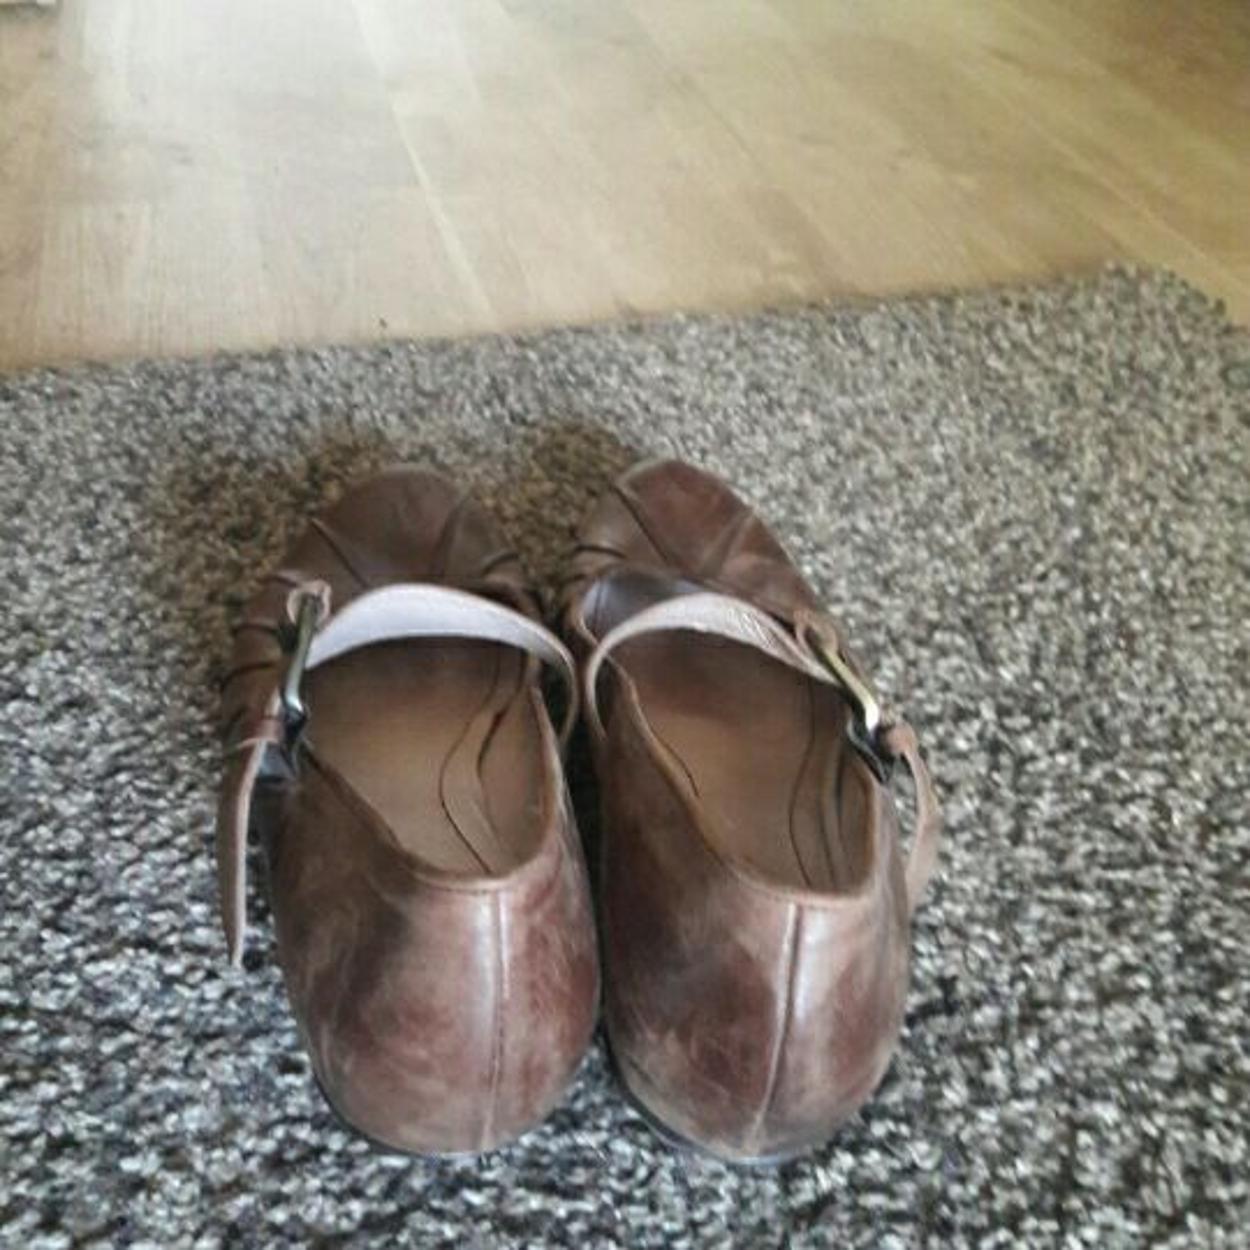 Anna Sui Kalın topuklu